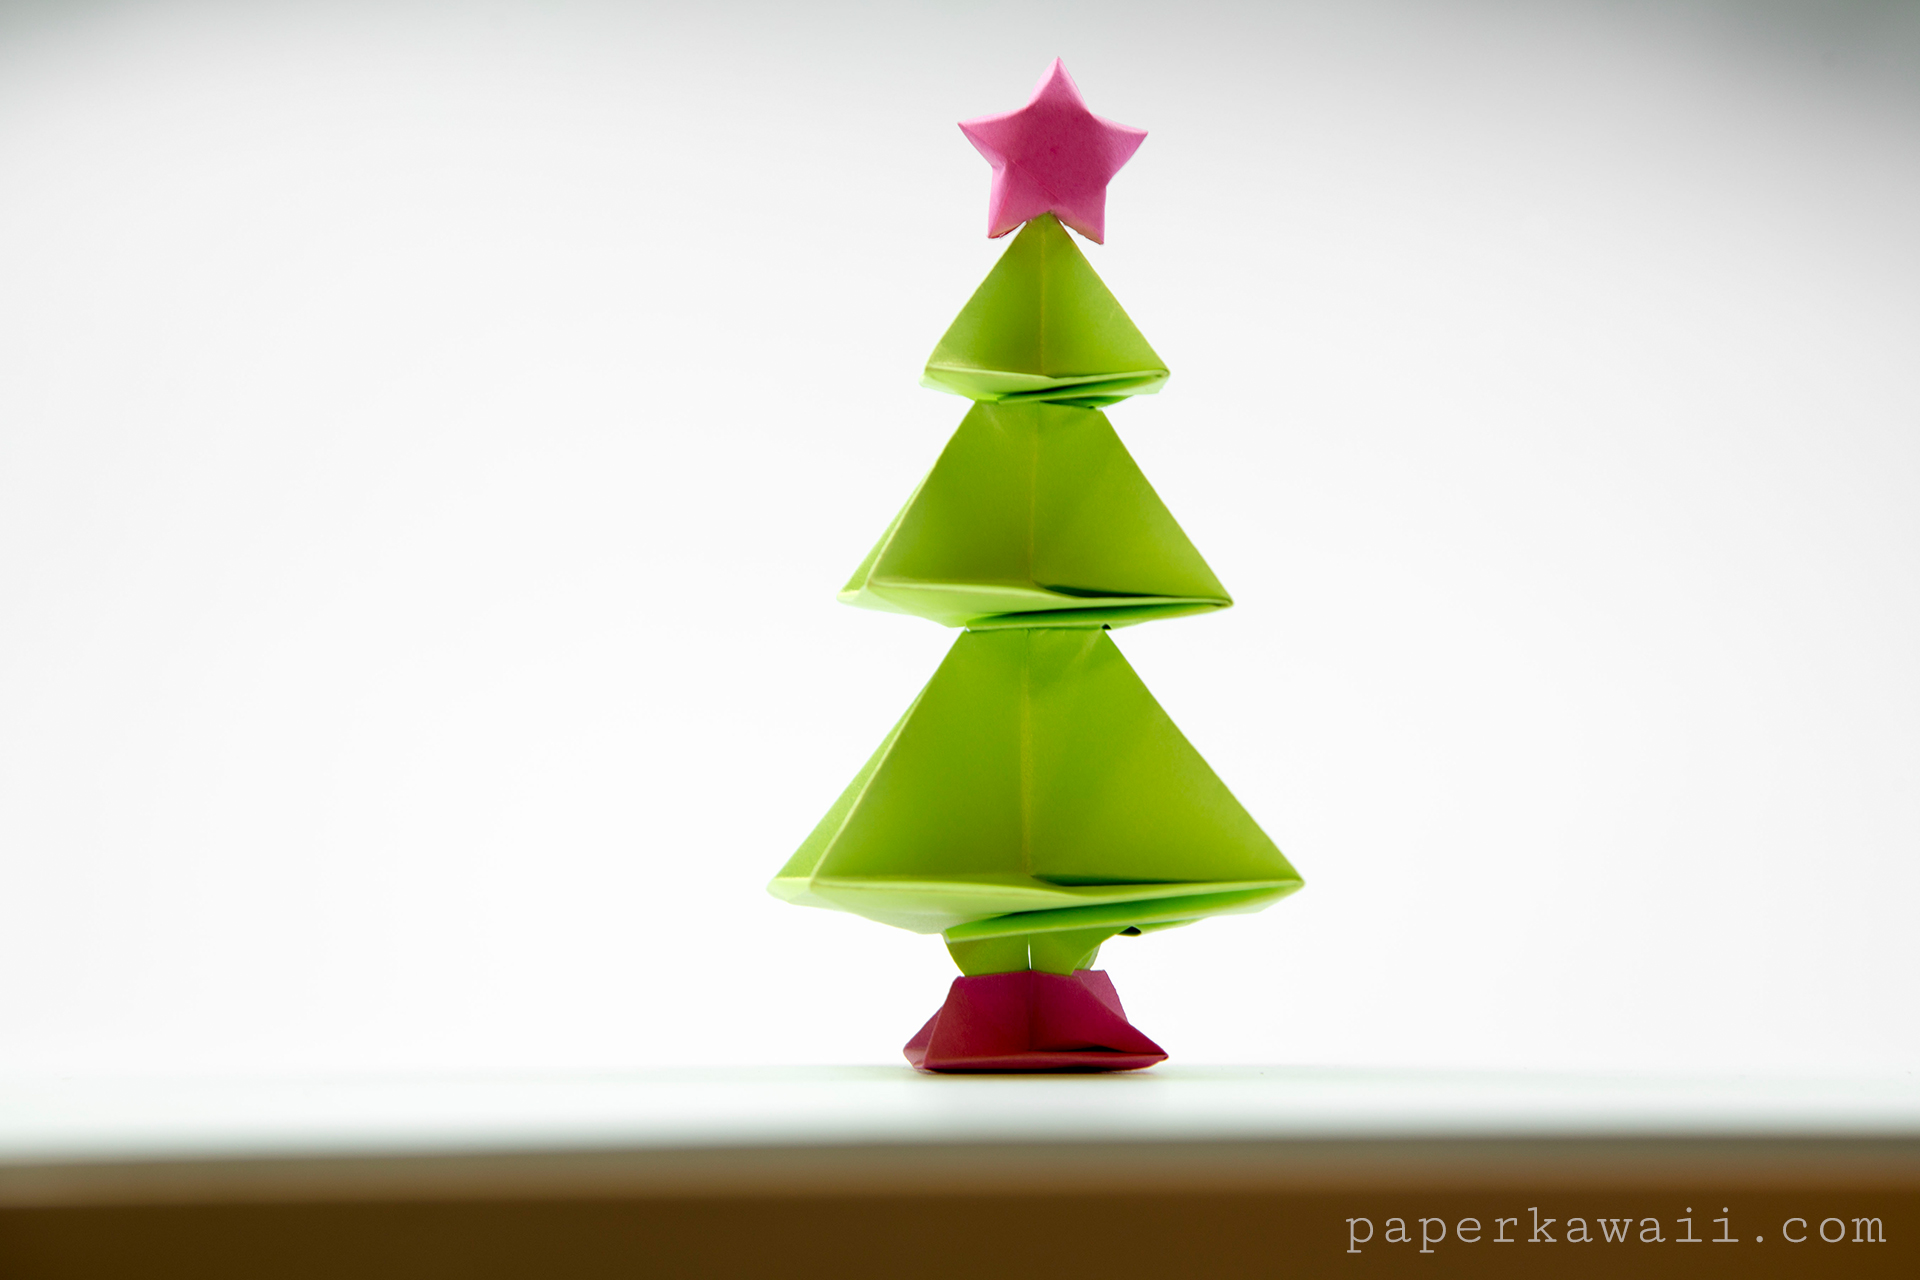 Origami Christmas Tree Tutorial - Paper Kawaii